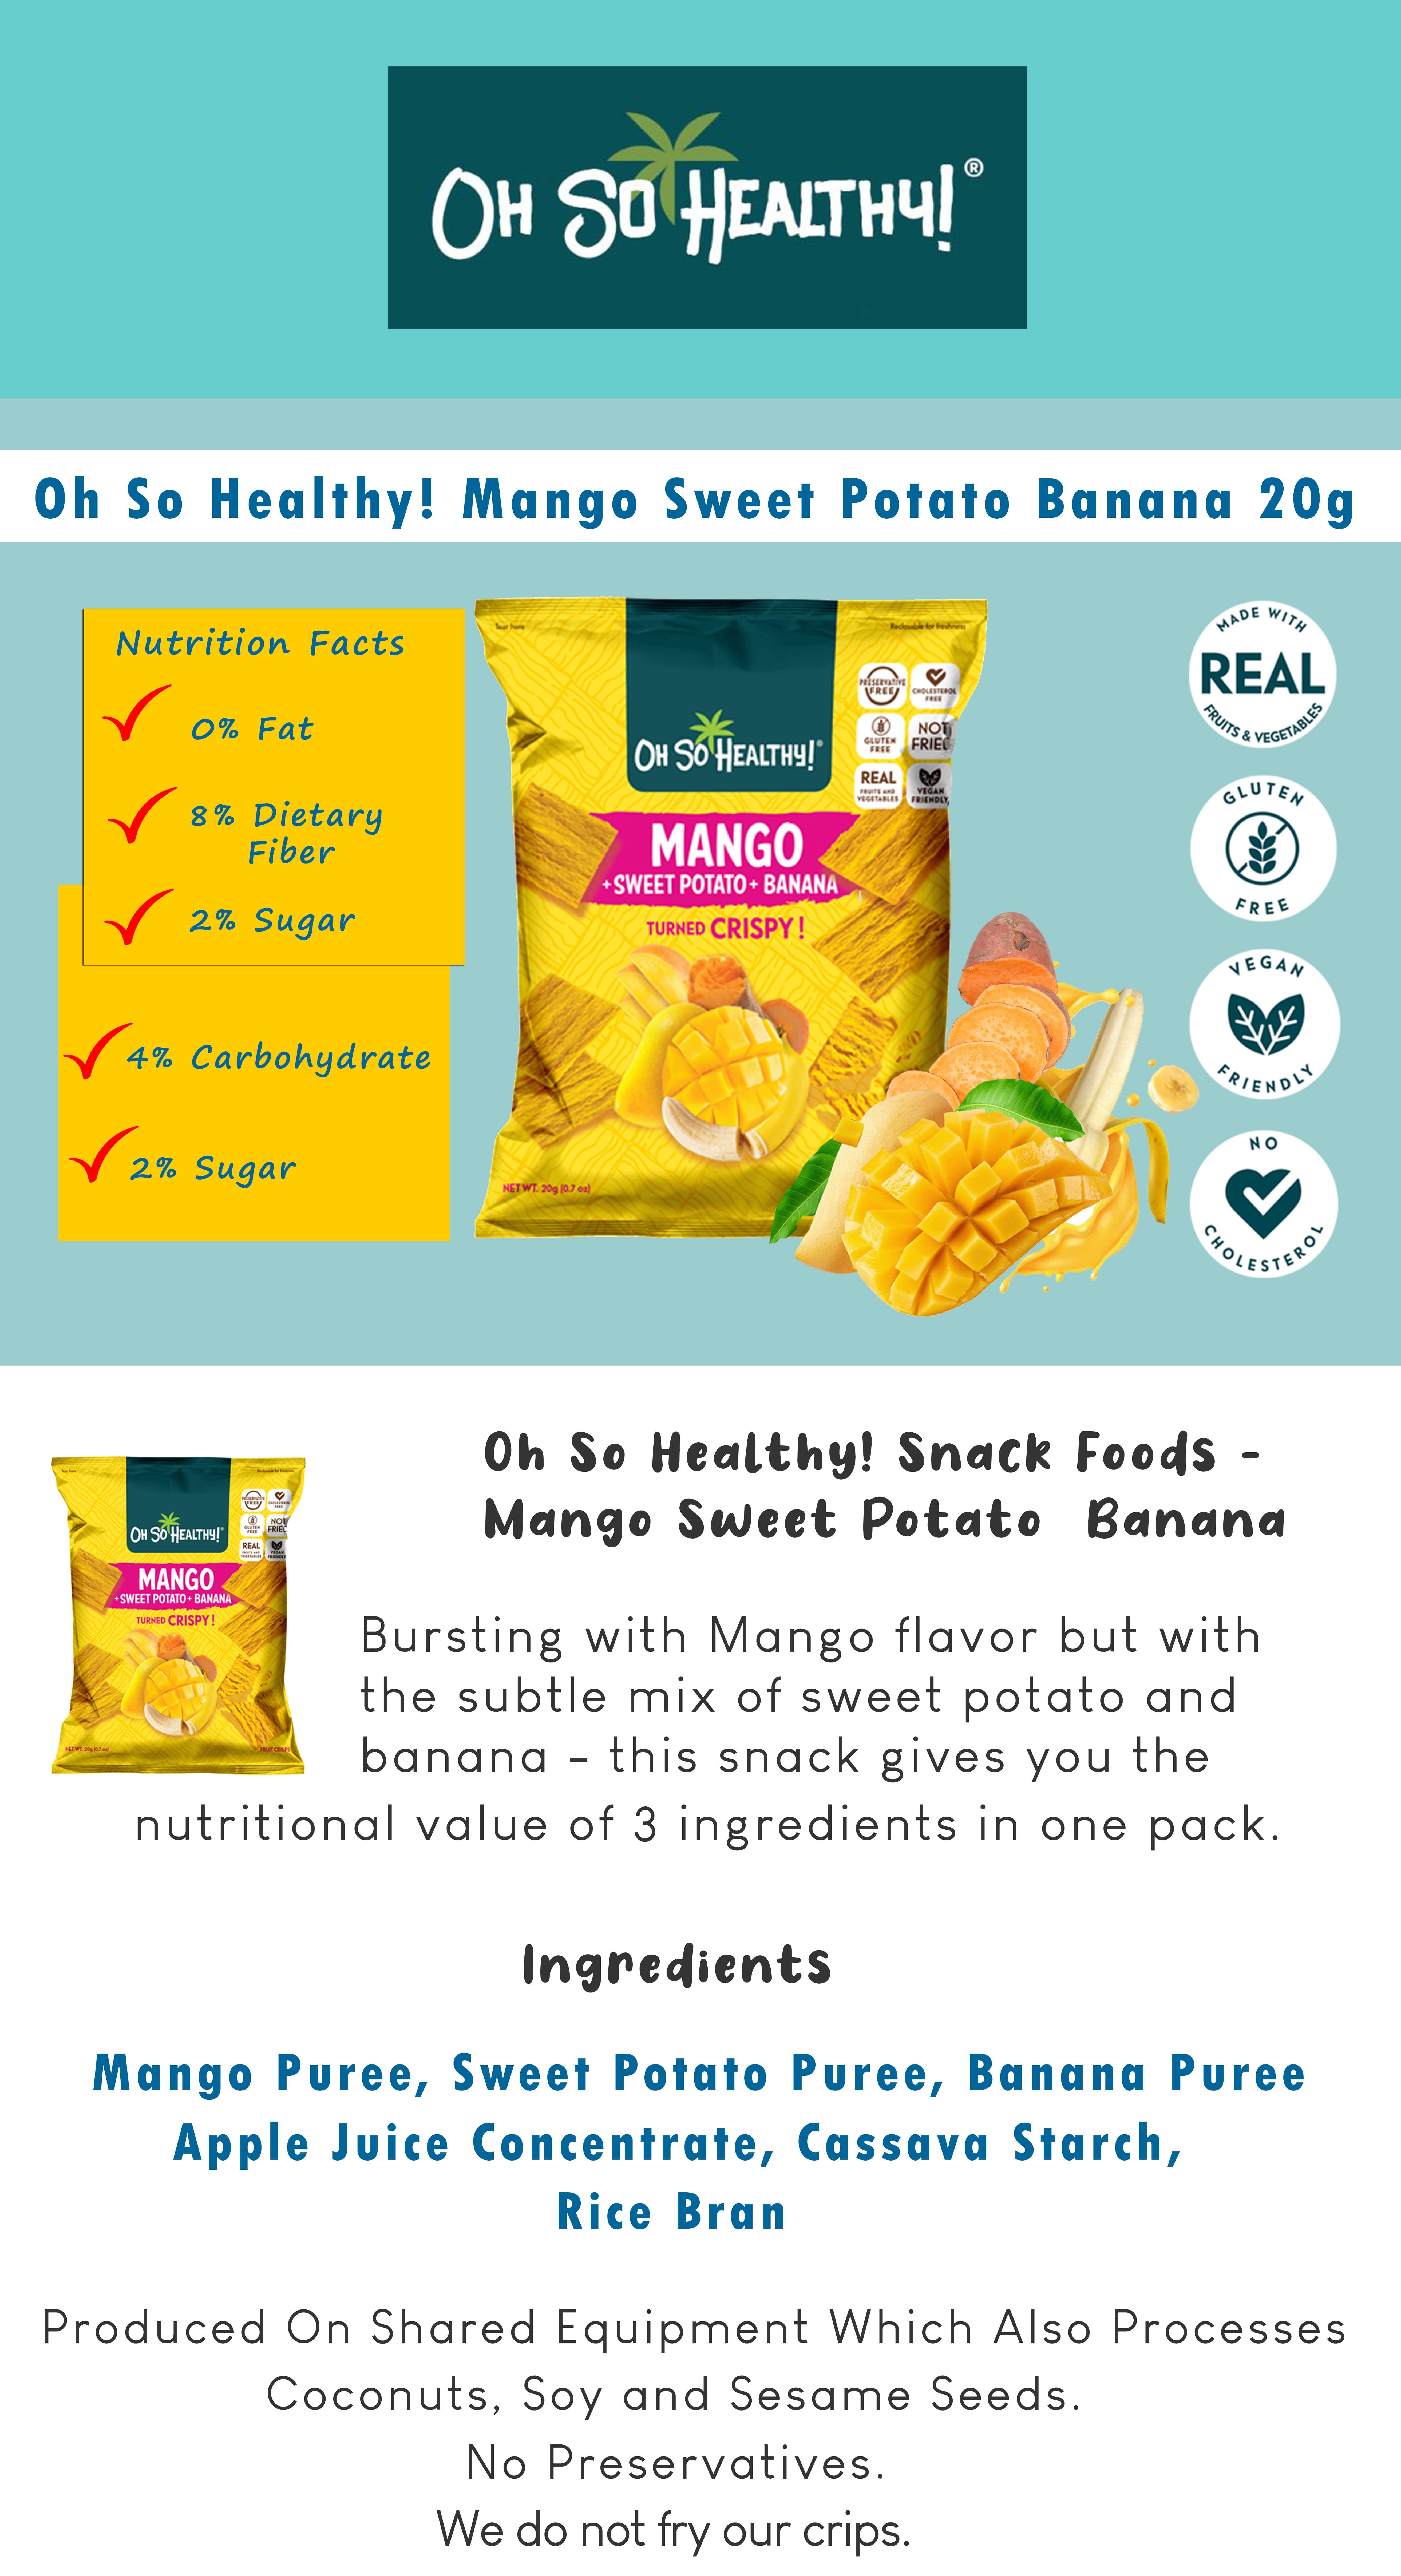 Mango Sweet Potato Banana 20g